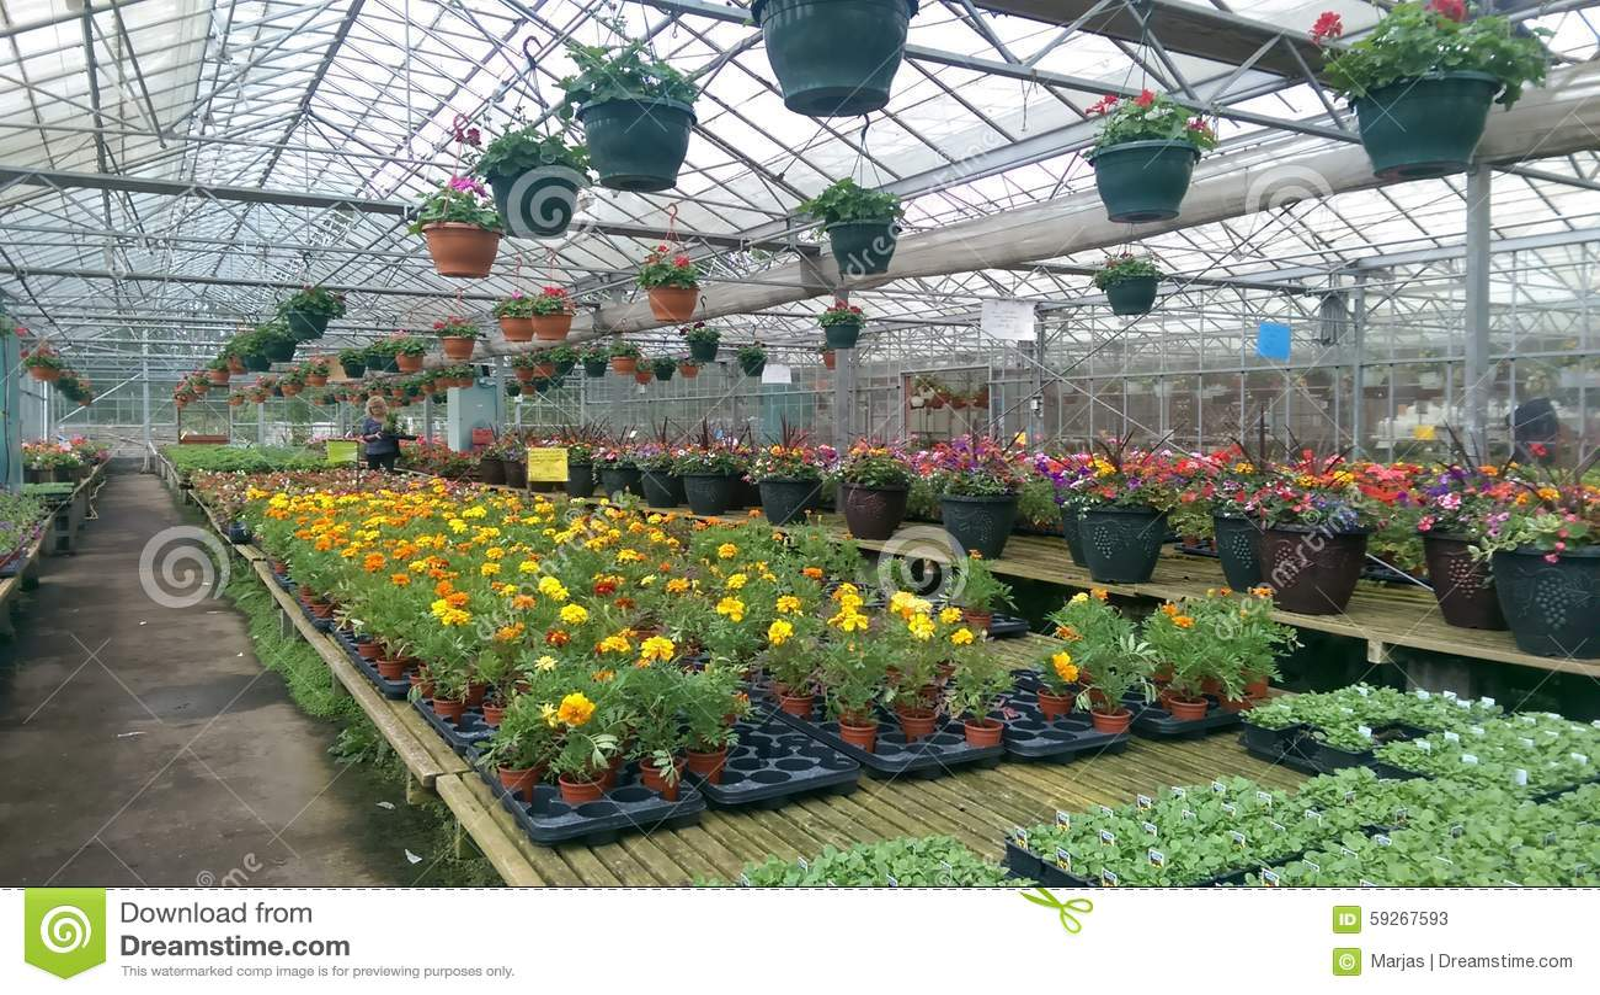 Outdoor Flowers For Sale Part - 17: Flowers Full Garden Greenhouse Plants Sale ...